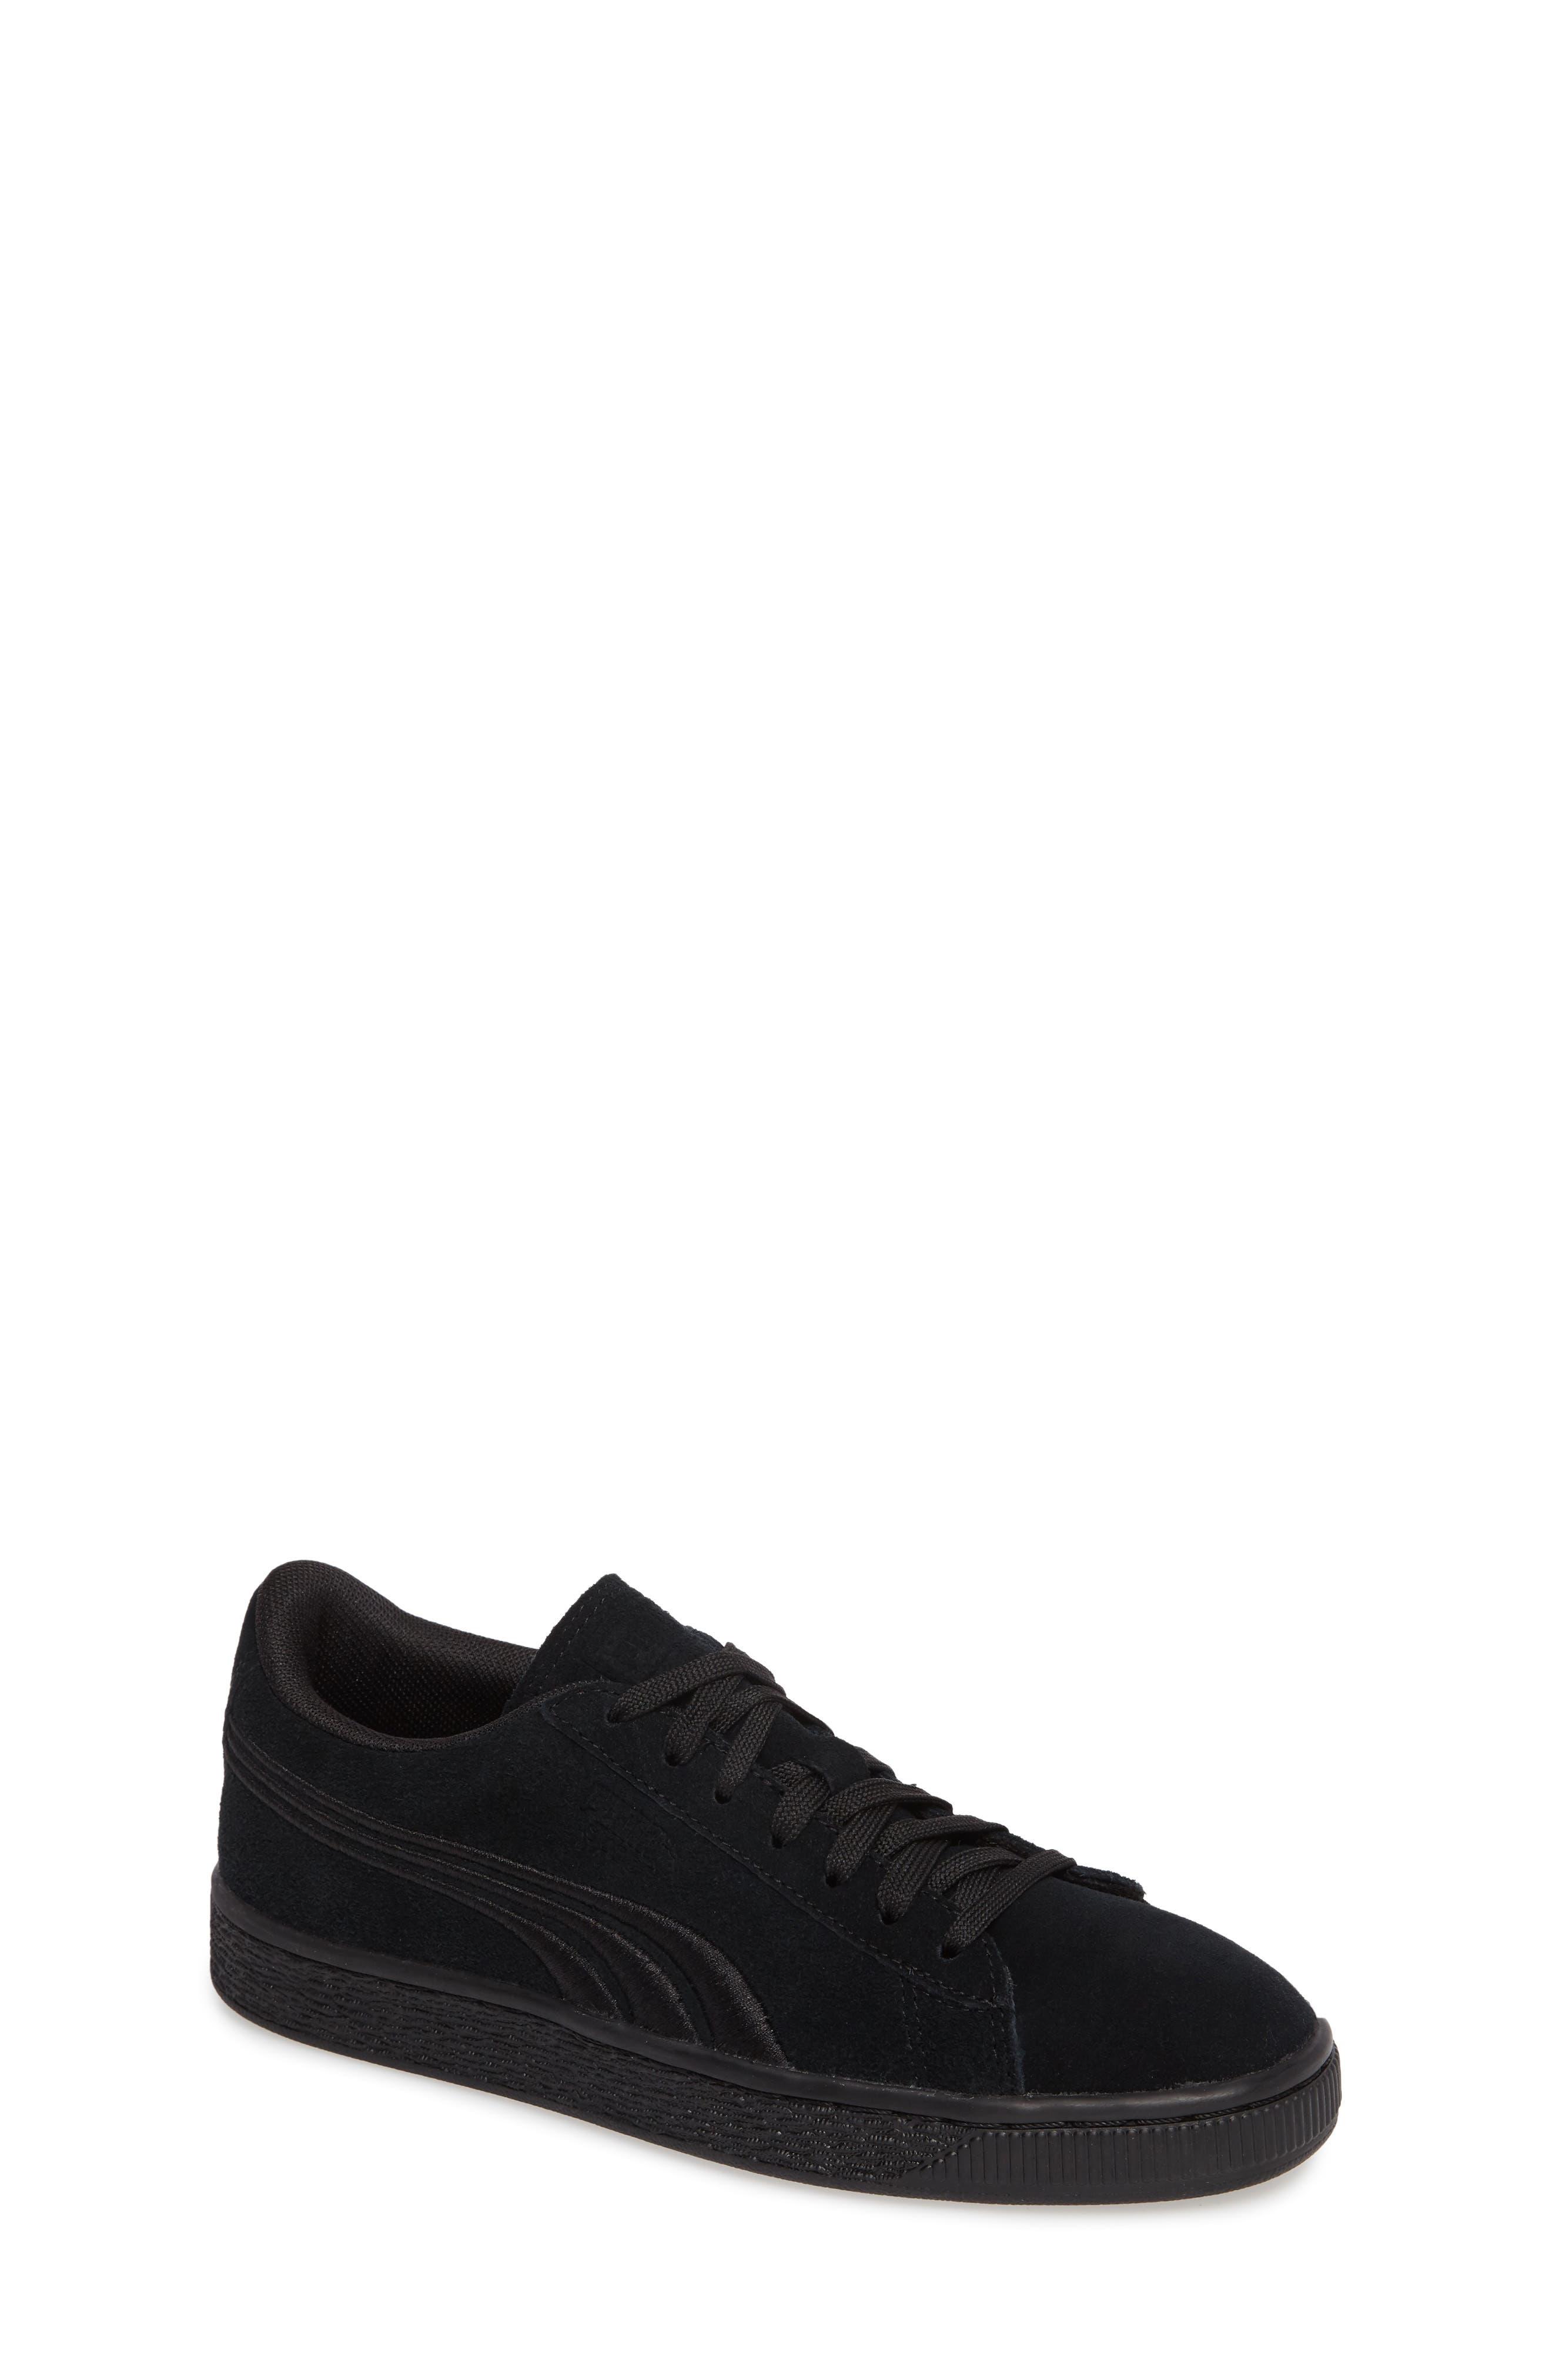 Suede Classic Badge Jr. Sneaker,                         Main,                         color, Black/ Black